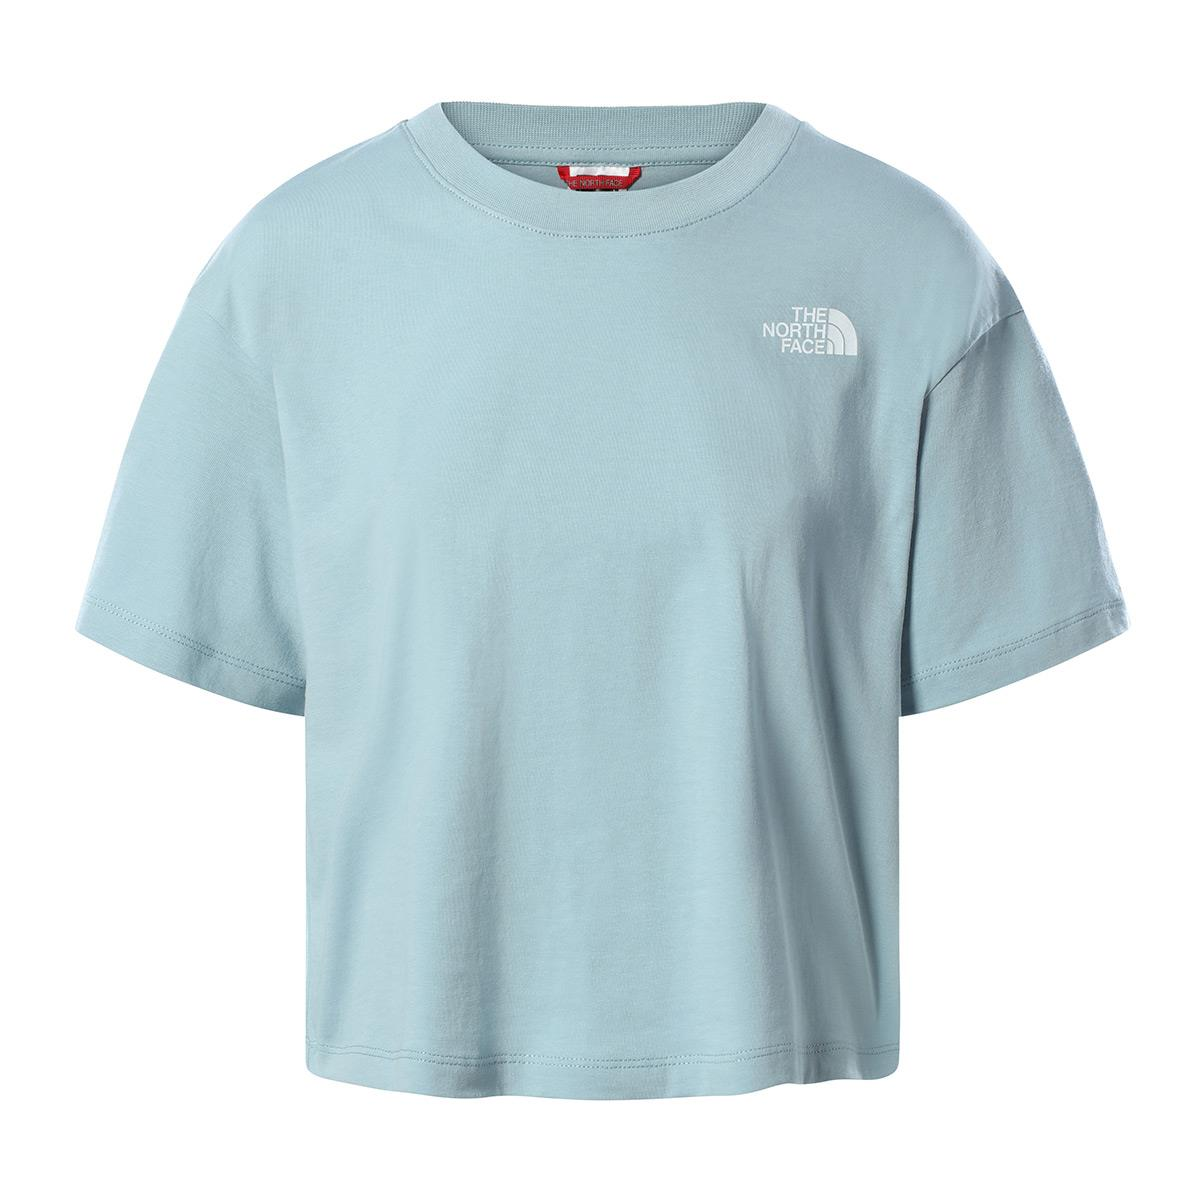 The North Face  Kadın CROPPED SIMPLE DOME Tişört